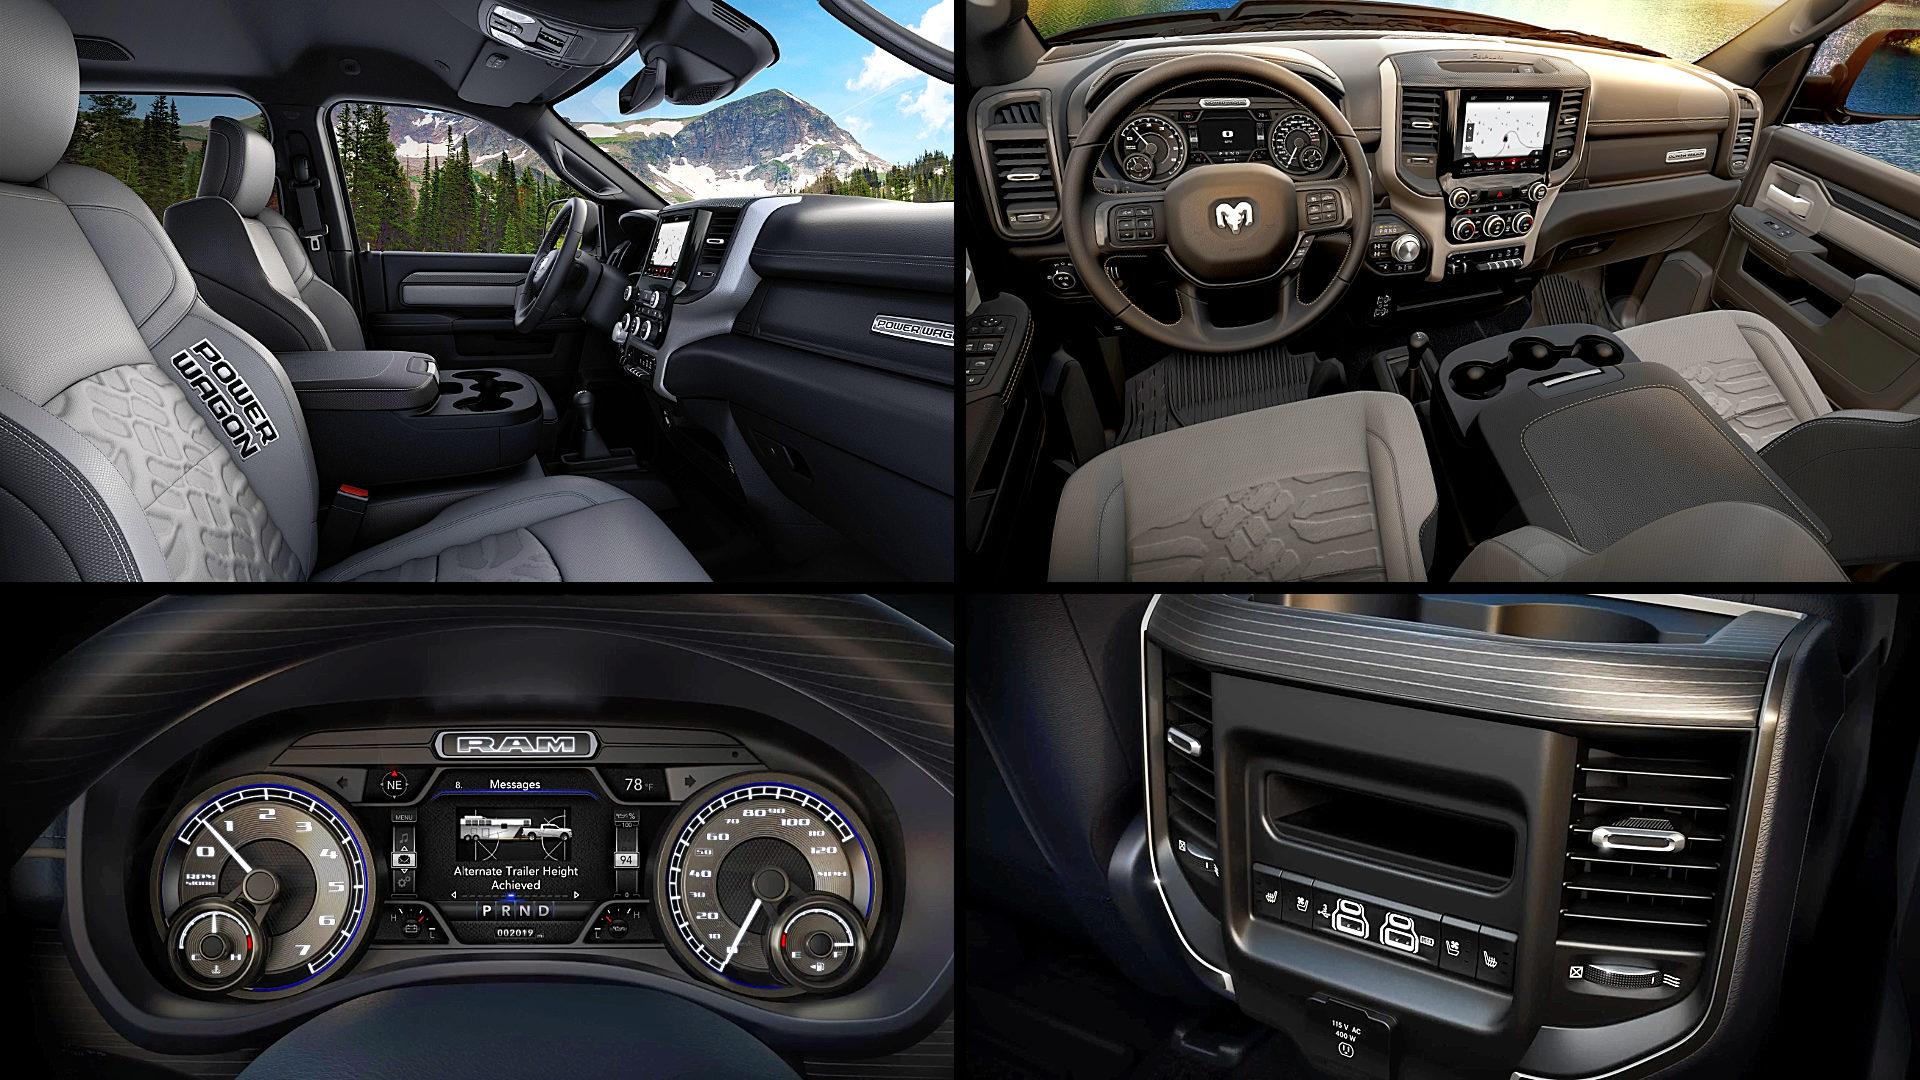 2020 Dodge Ram 2500 Interior Inside